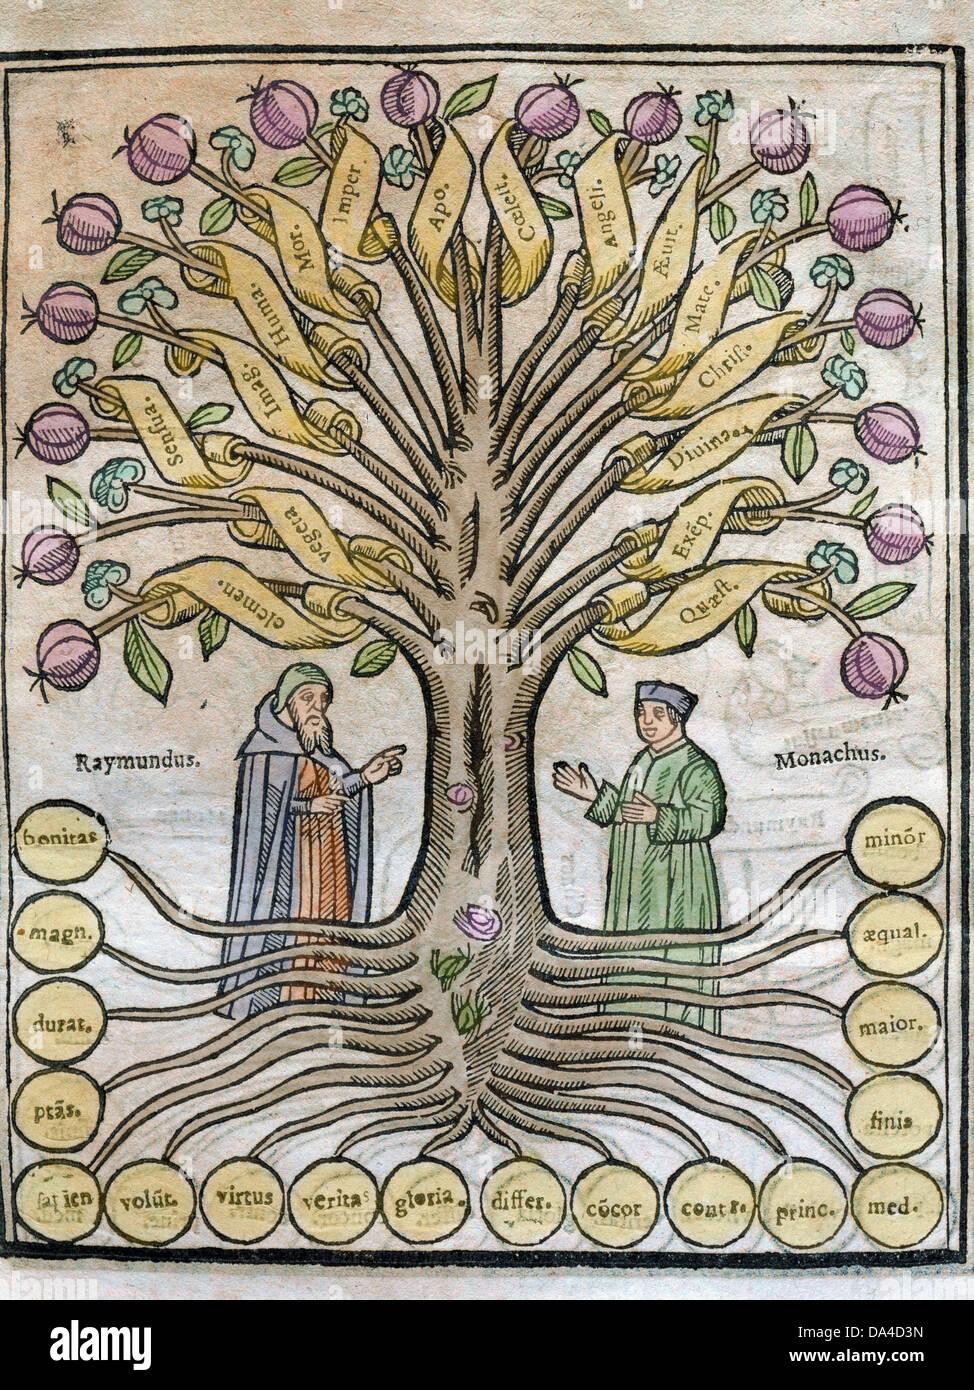 "Llull, Ramon (1233/1235-1315/1316). Mallorquinischen Schriftstellers und Philosophen.  ""Arbor Scientiae"". Stockbild"